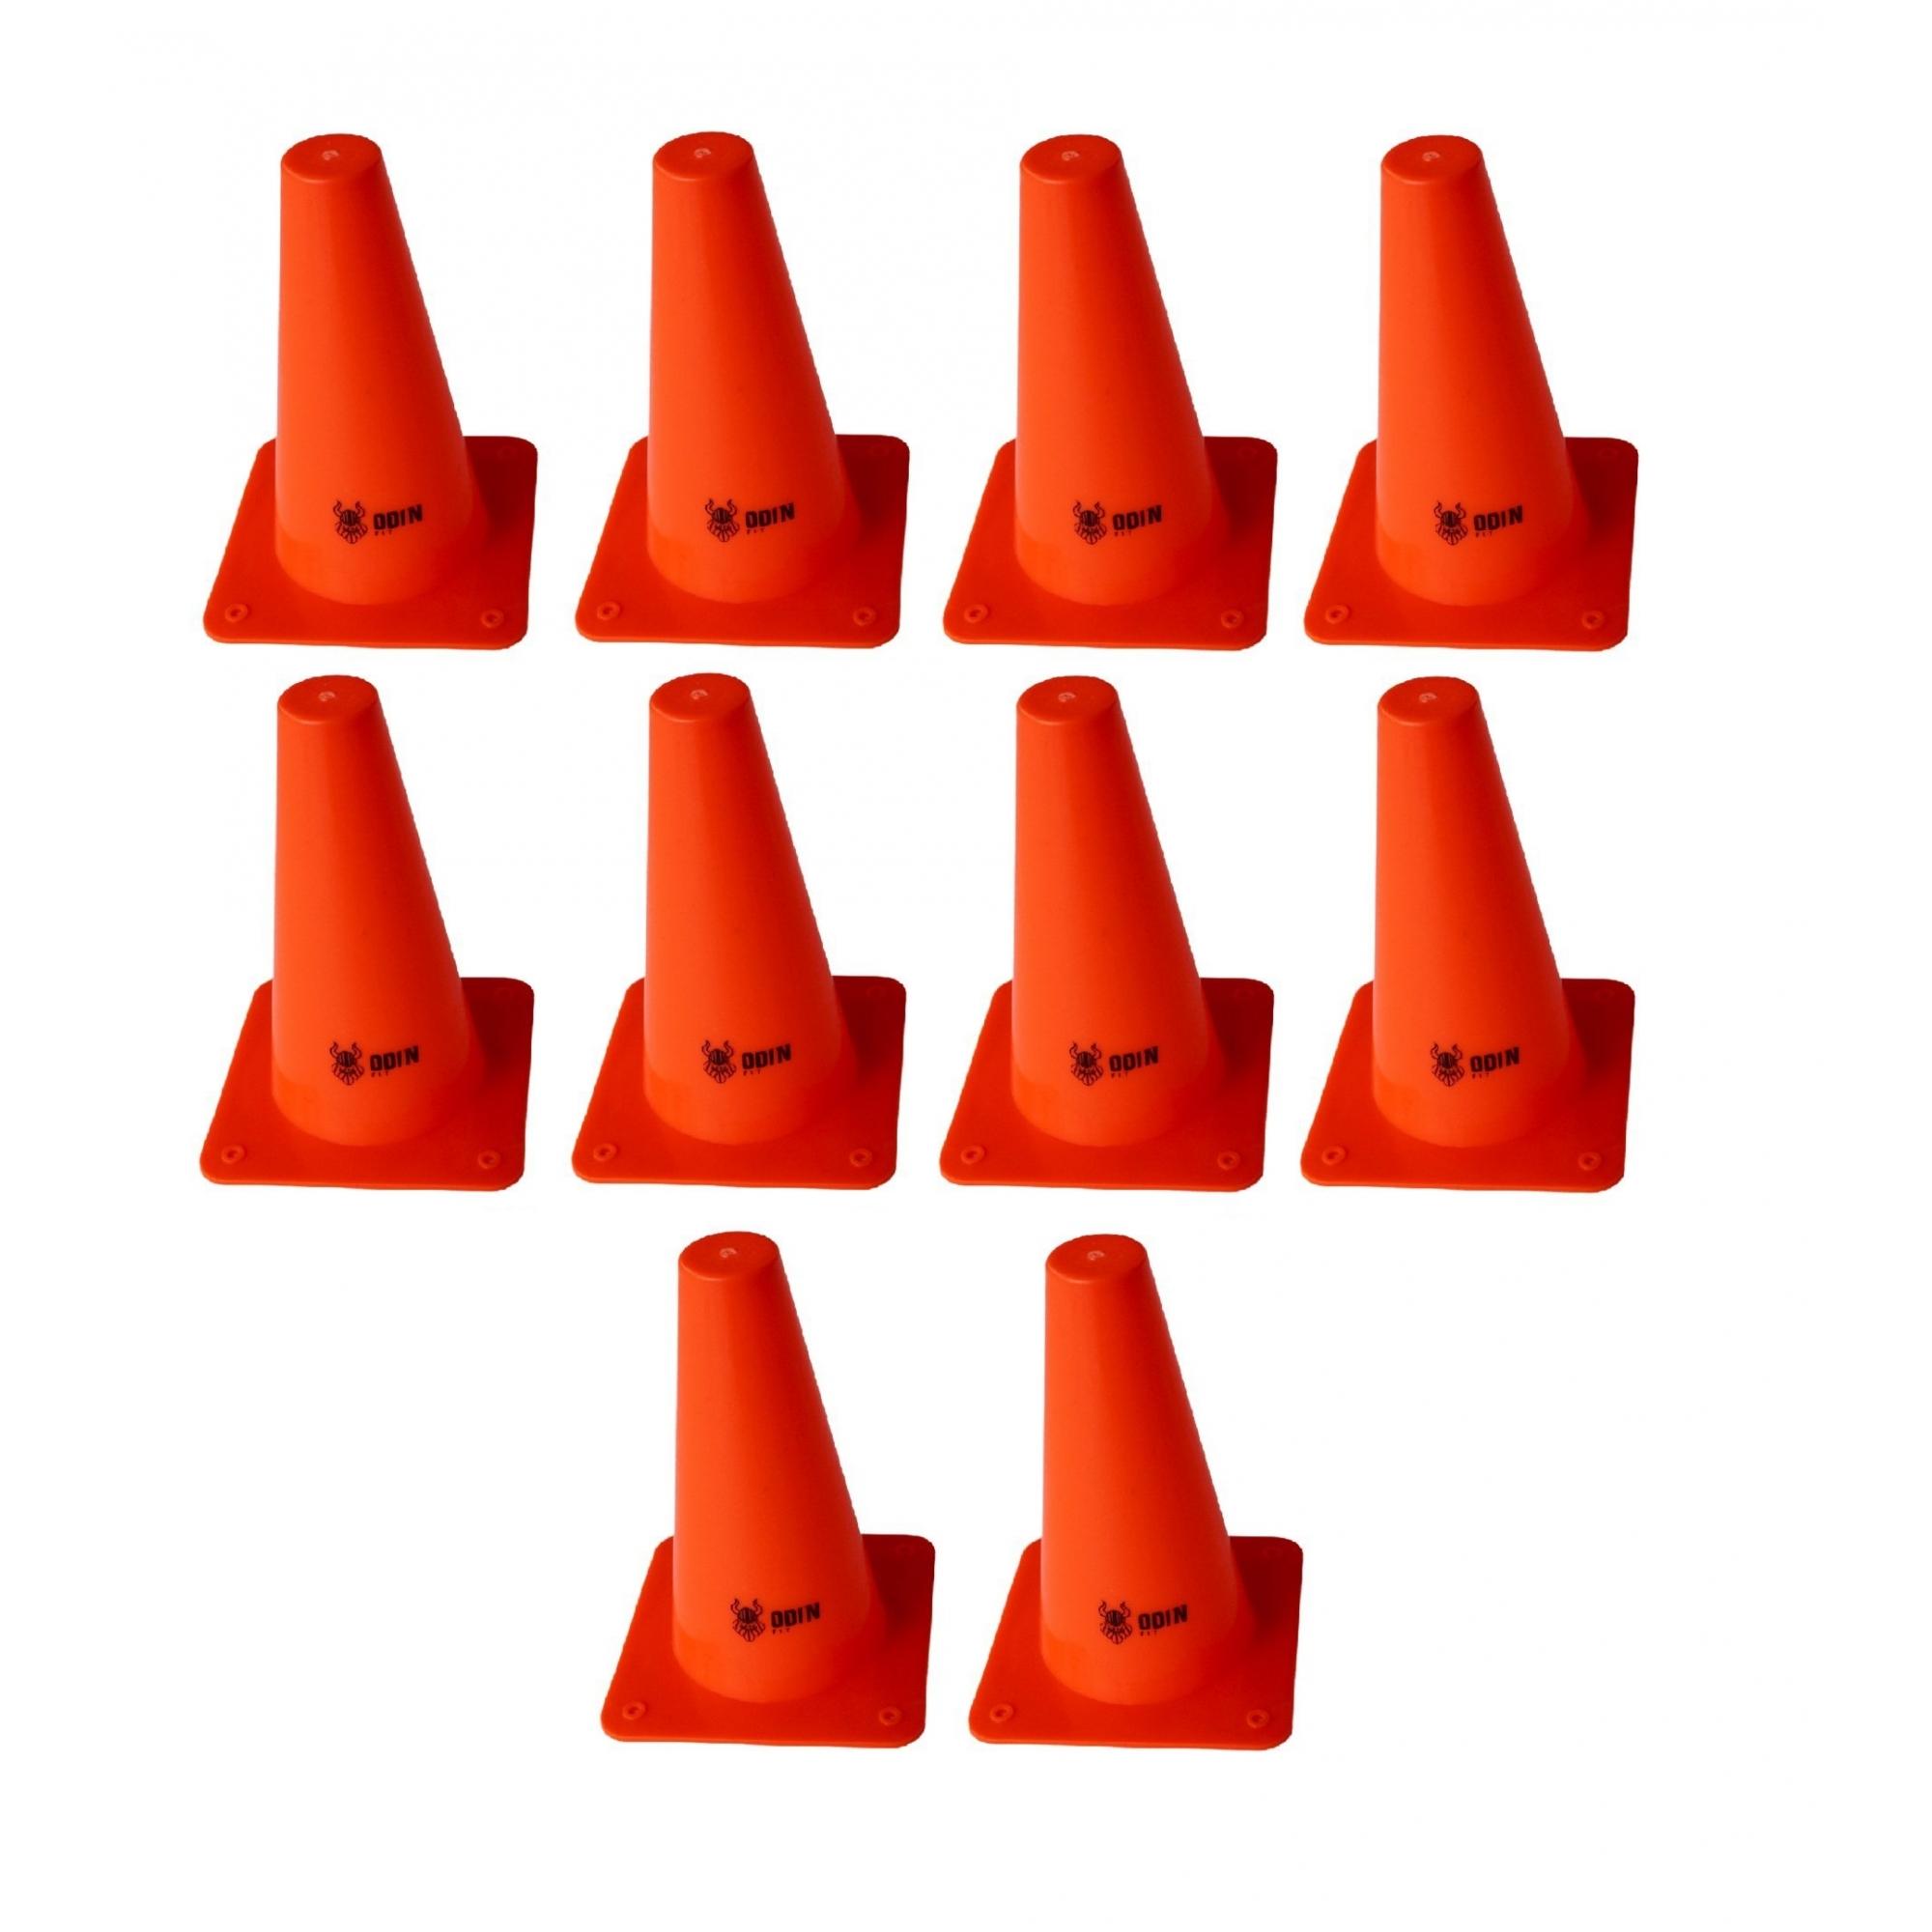 Kit 10 Cones Pequenos 15cm Laranja - Odin Fit